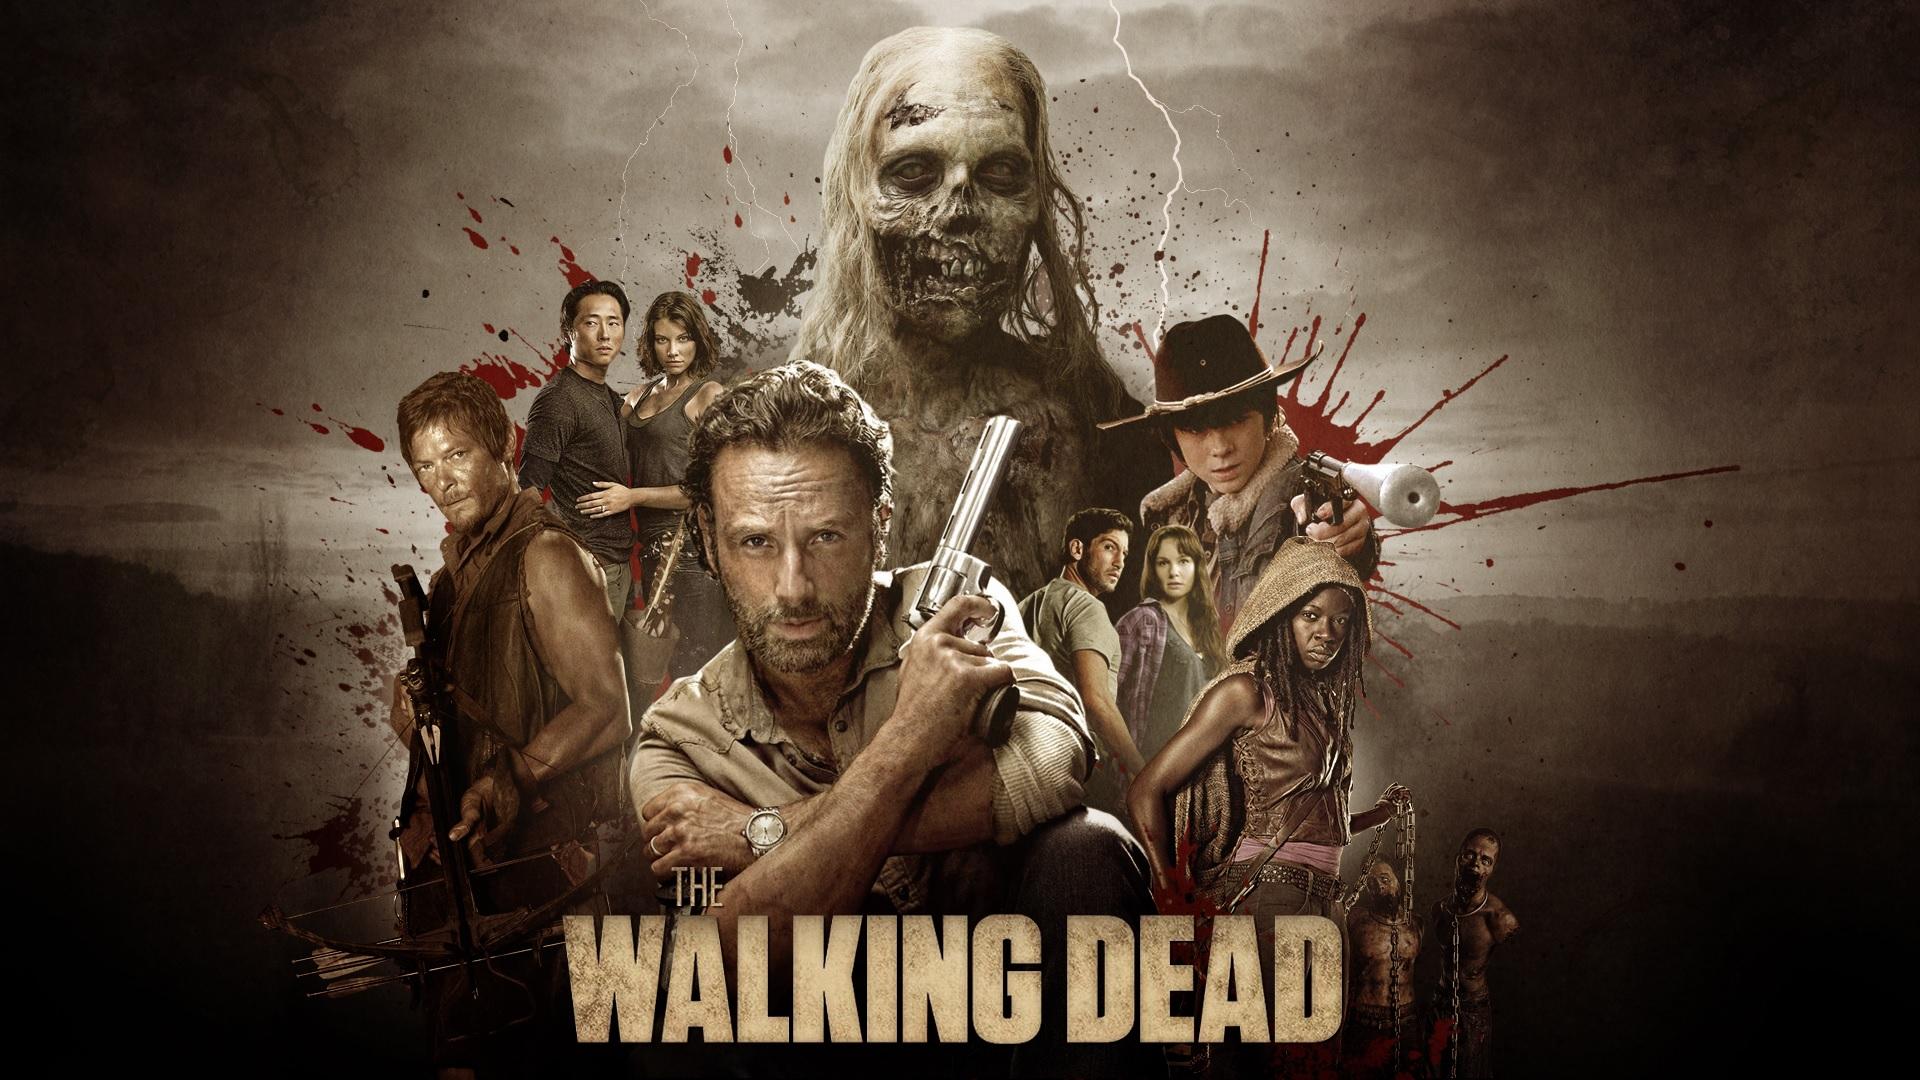 The Walking Dead - Mejor Serie de TV de Zombis